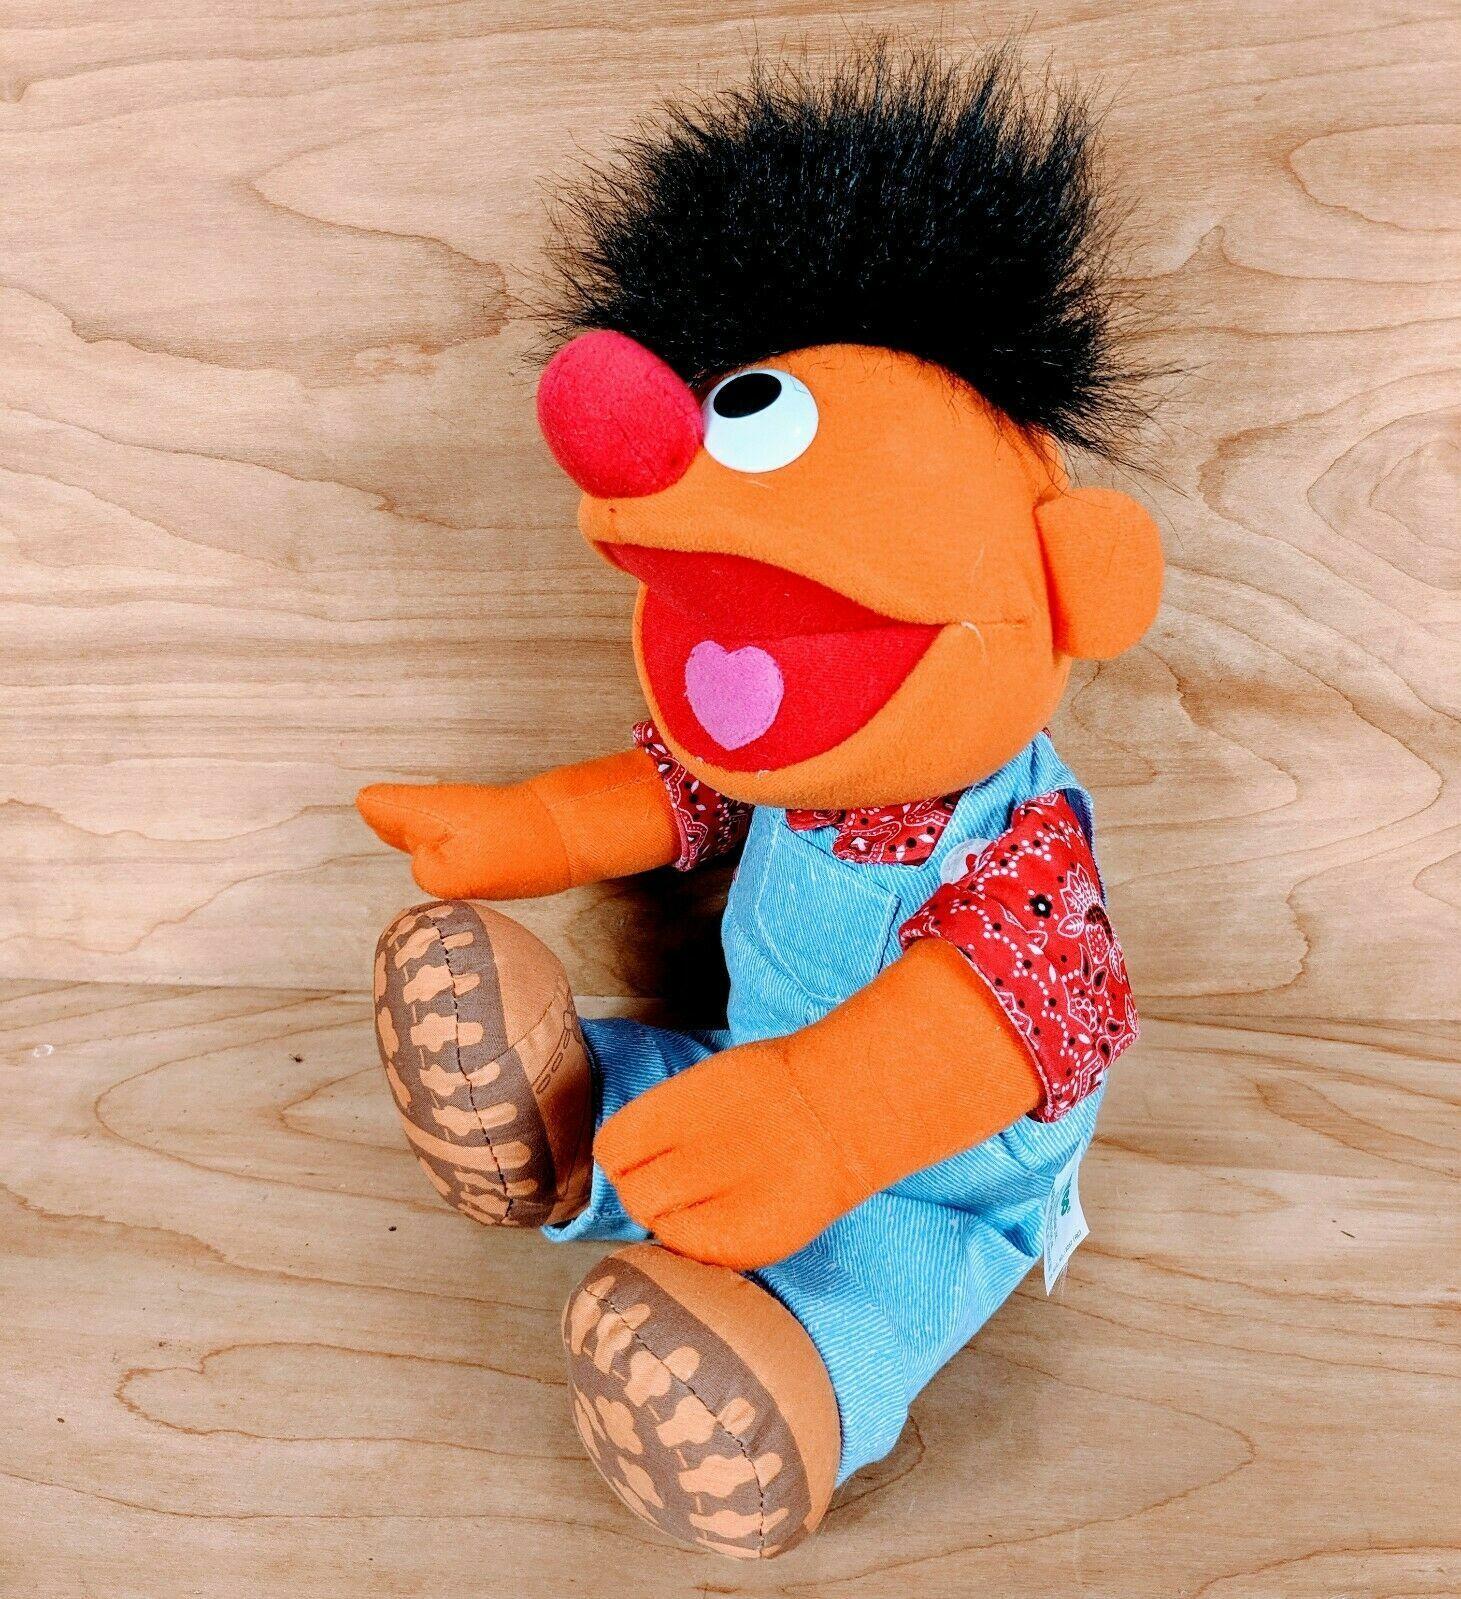 Vintage Tyco 1996 Sesame Street TALKING Farmer Ernie Plush 14 Doll RARE - $45.99